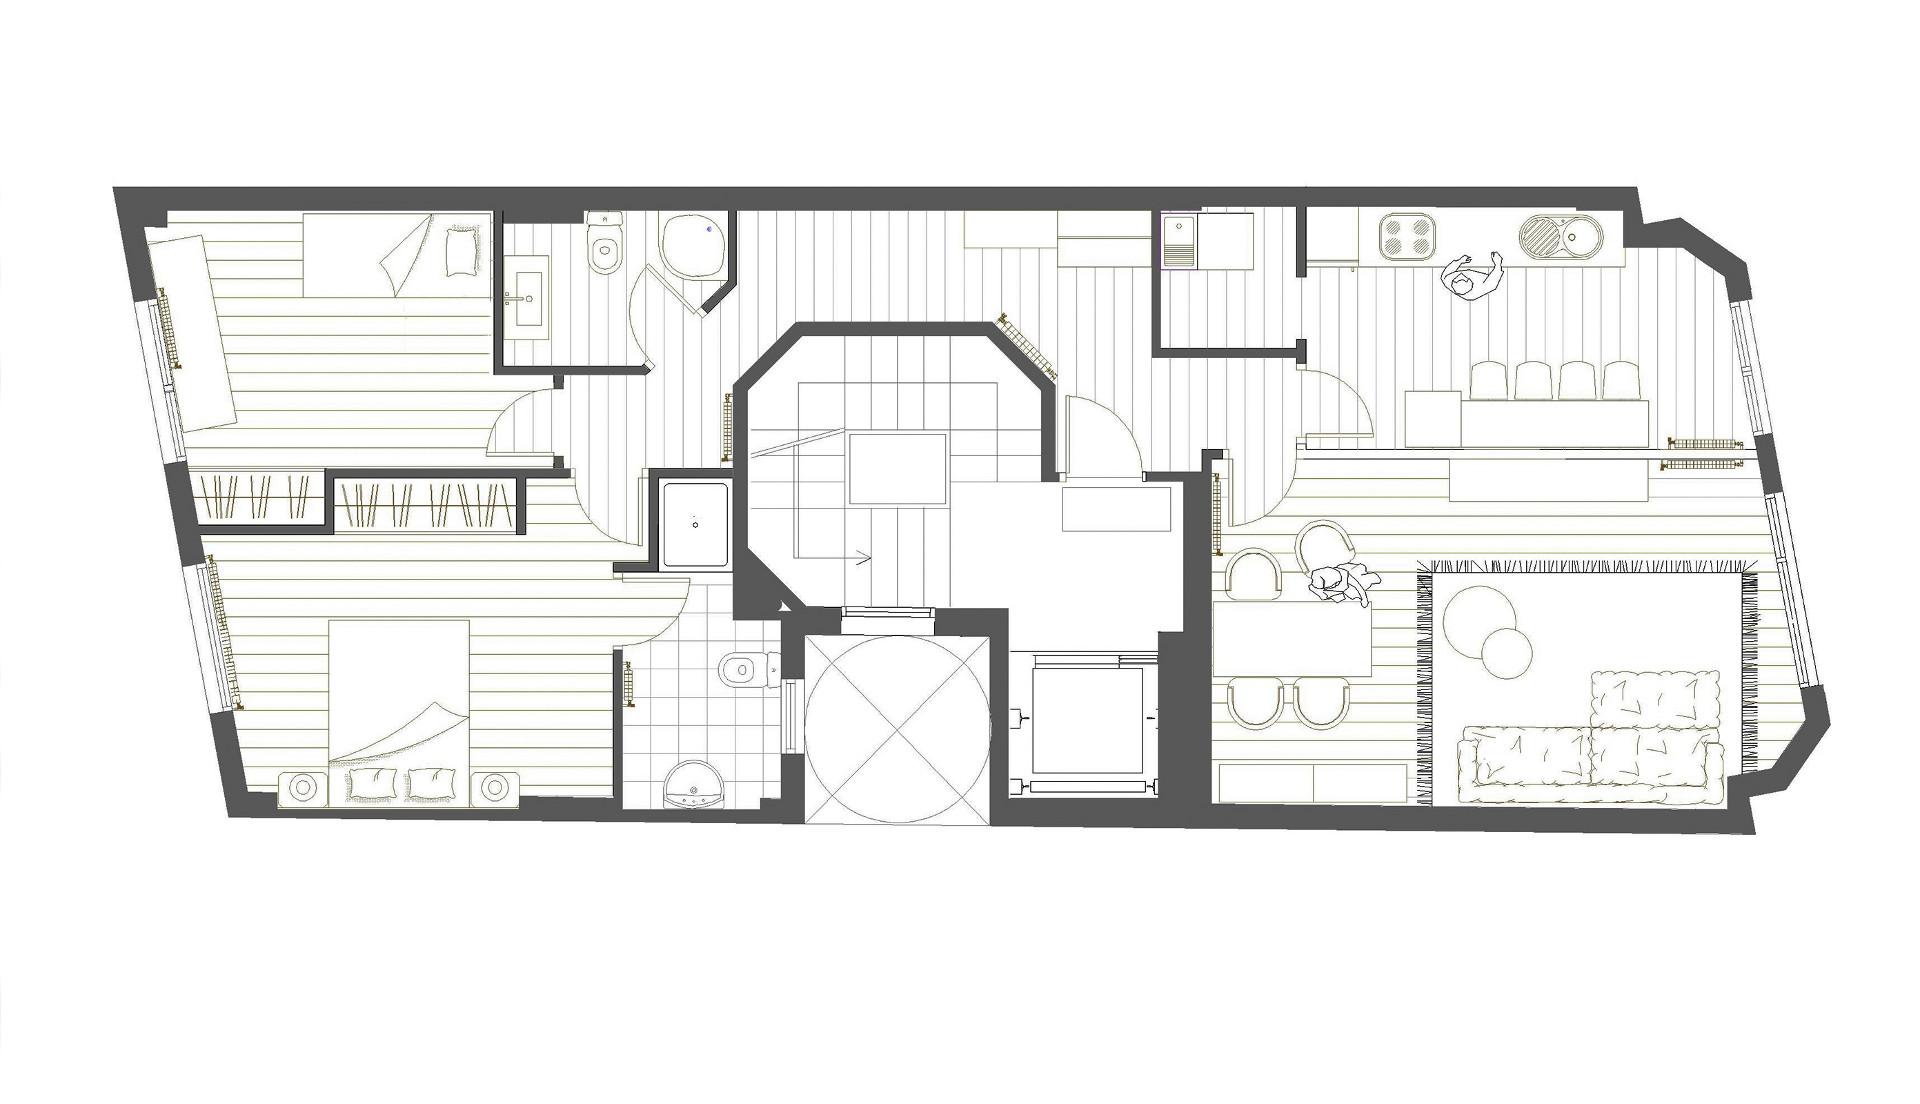 pisos-venta-home